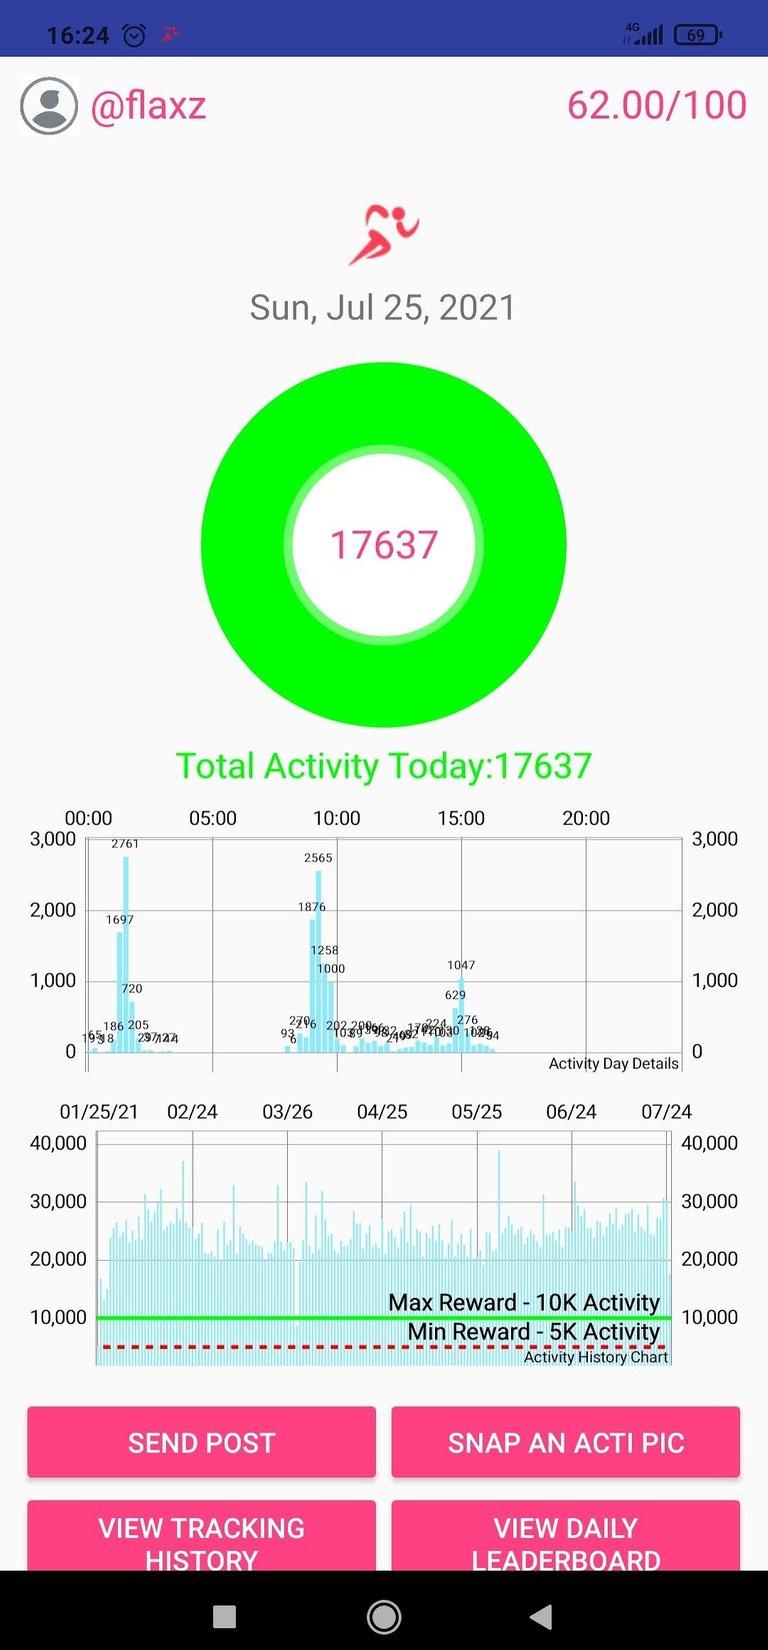 Screenshot_2021-07-25-16-24-22-112_io.actifit.fitnesstracker.actifitfitnesstracker.jpg